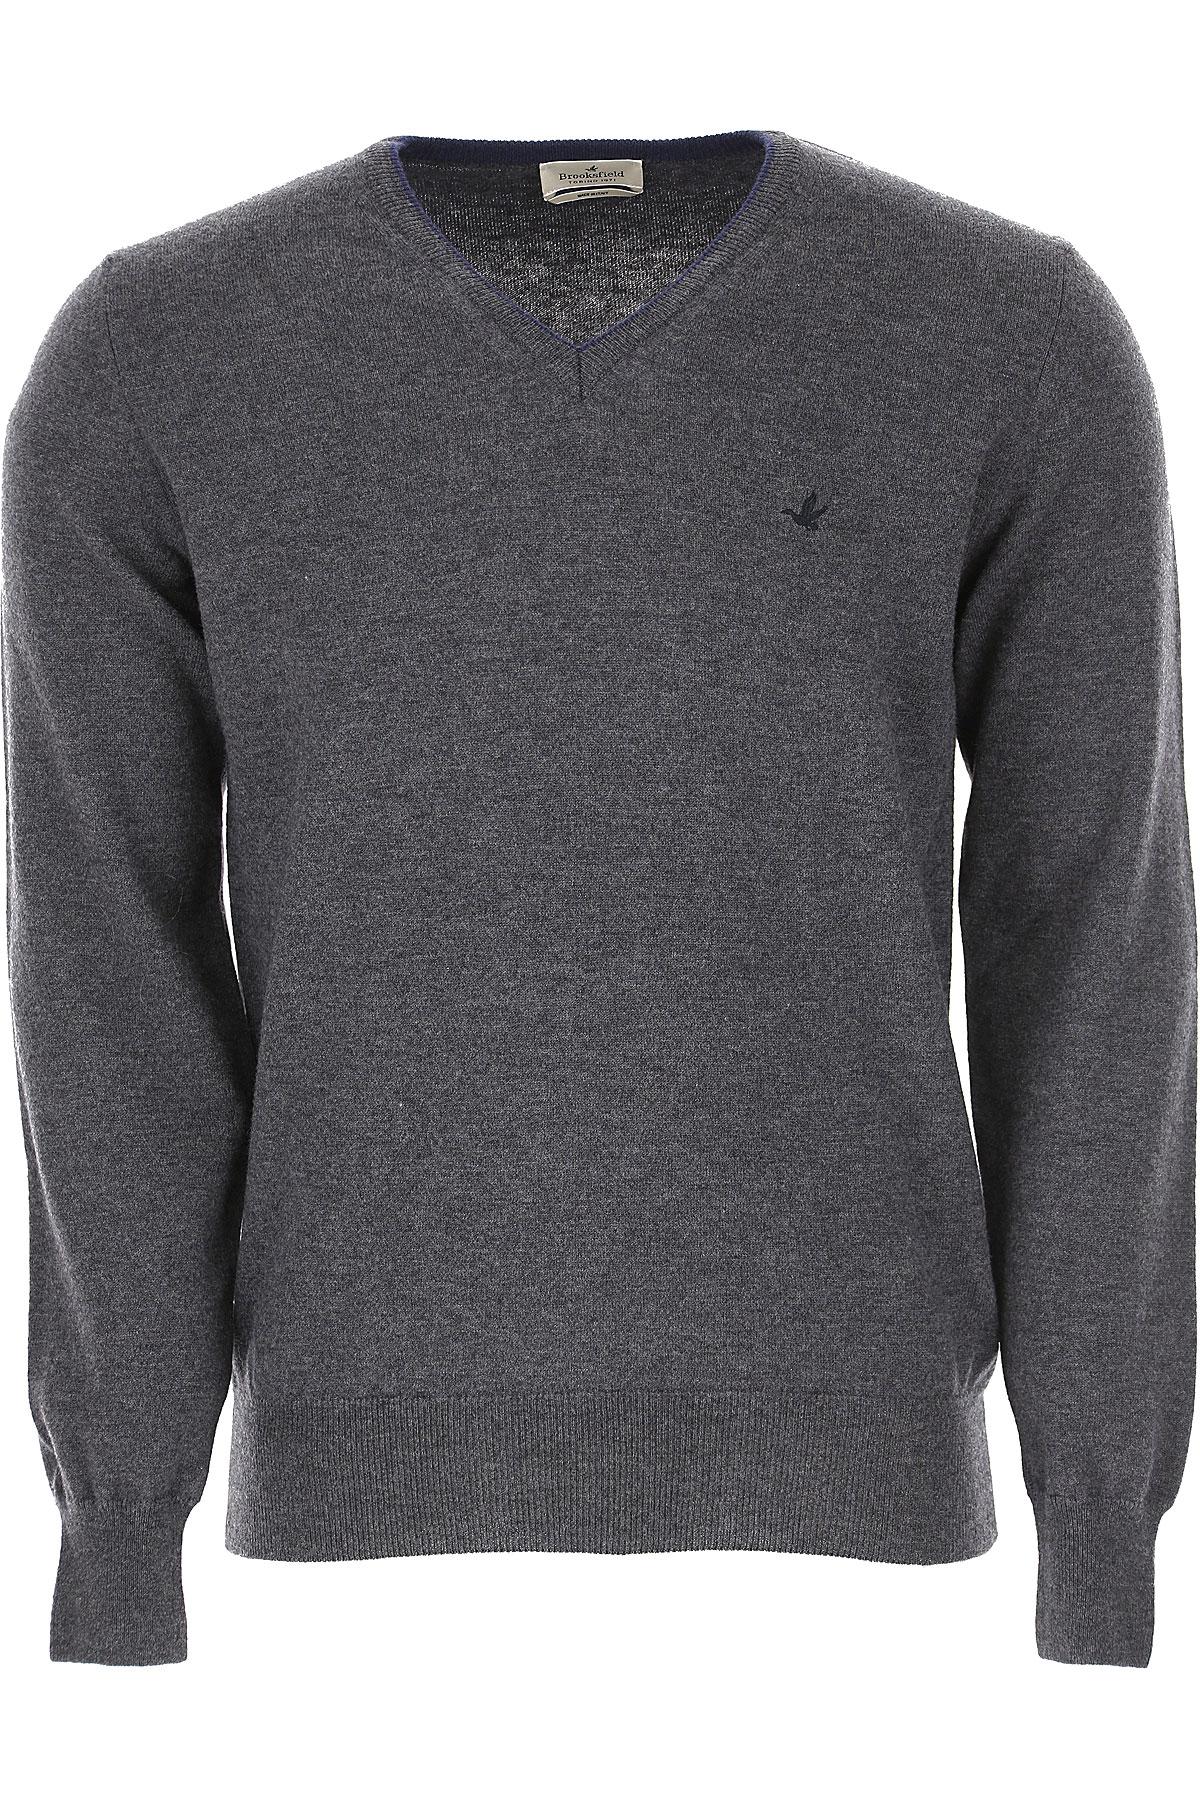 Brooksfield Sweater for Men Jumper On Sale, Anthracite Grey, Virgin wool, 2019, L M XXL XXXL